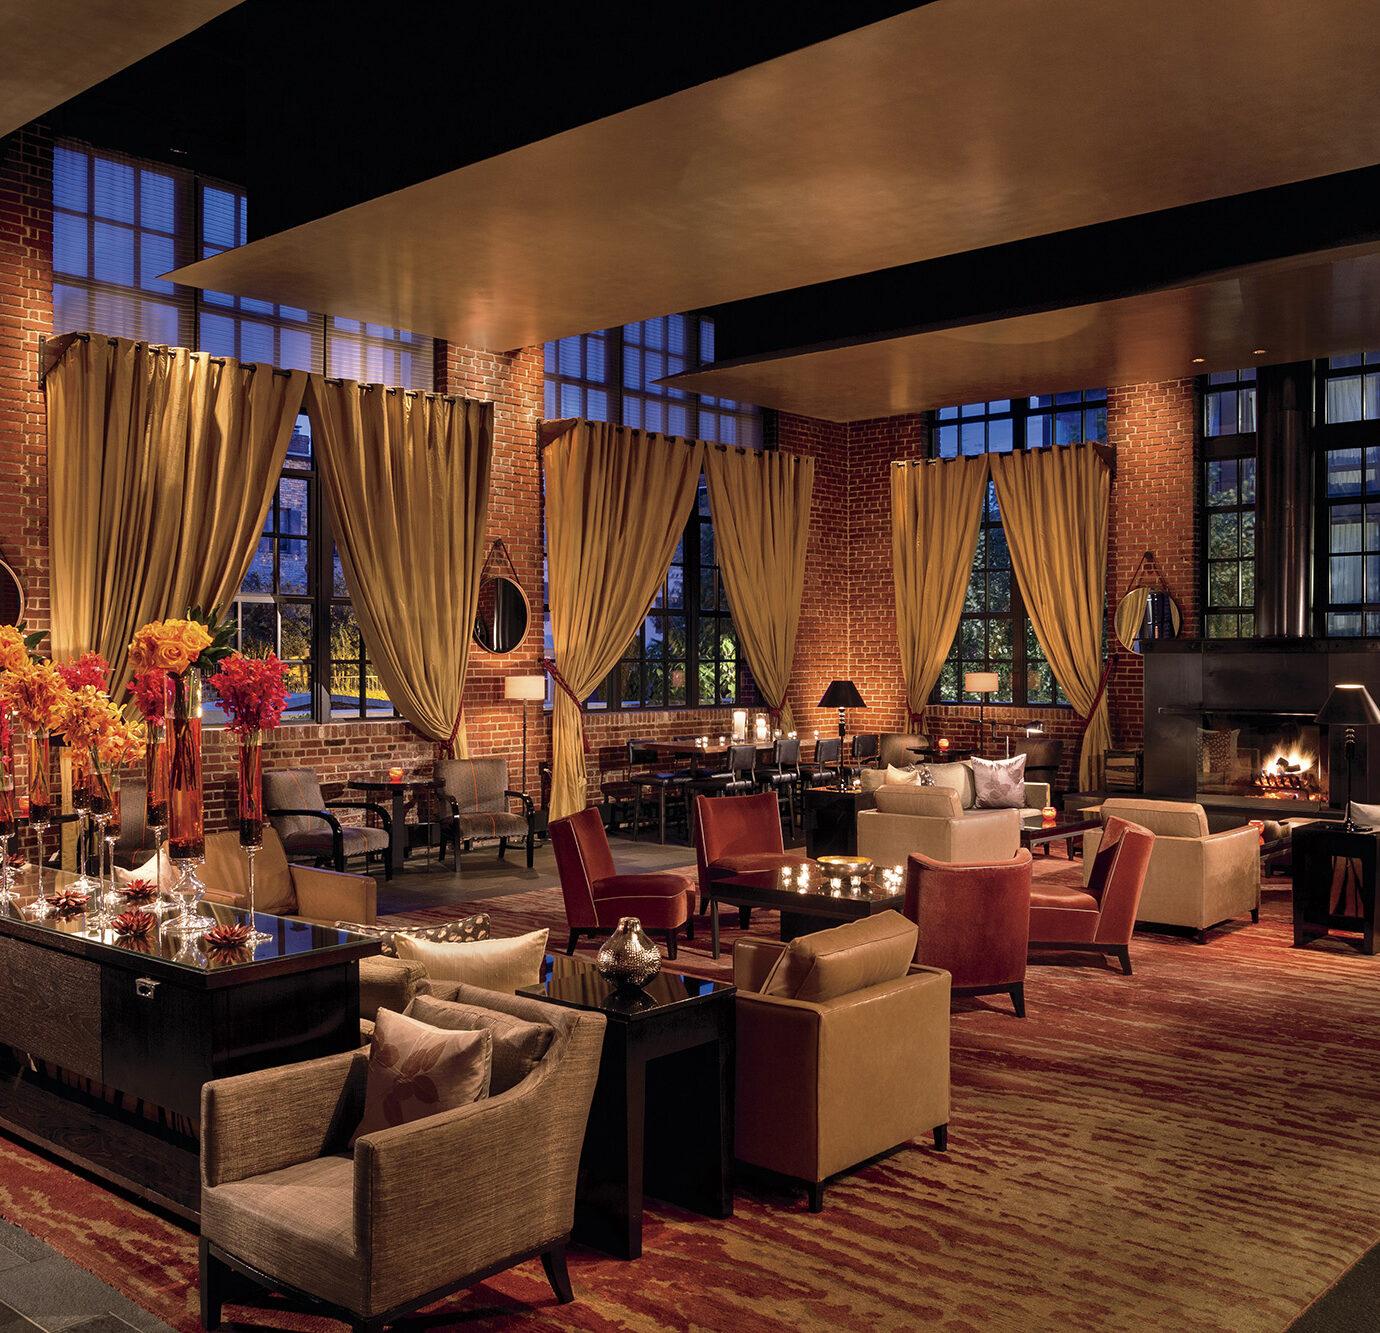 Dining room at The Ritz-Carlton Georgetown, Washington, D.C.